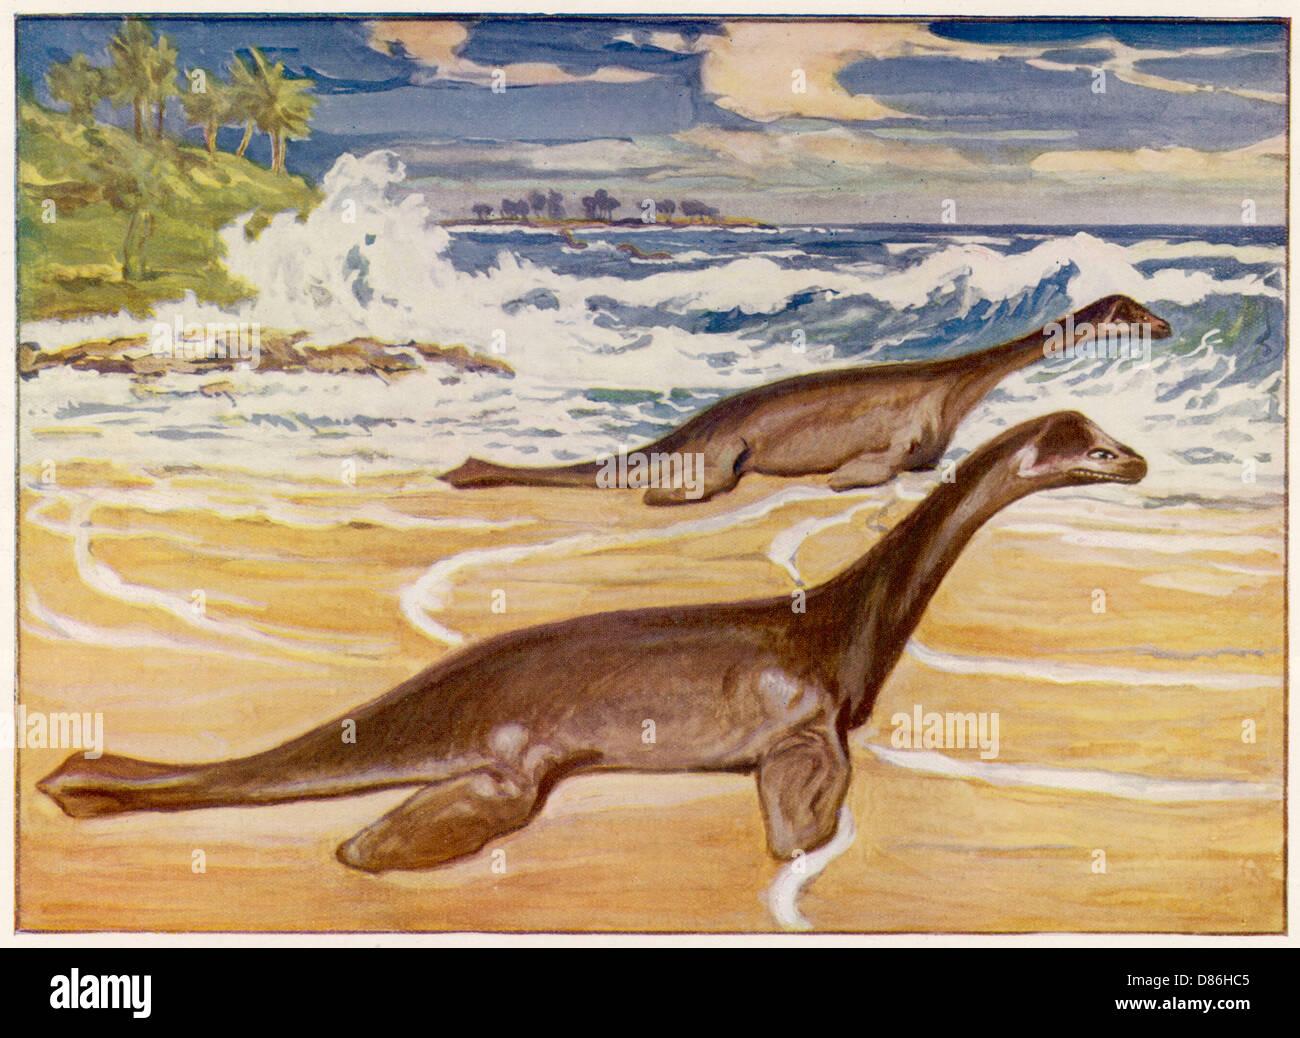 Extinct Plesiosaurs - Stock Image